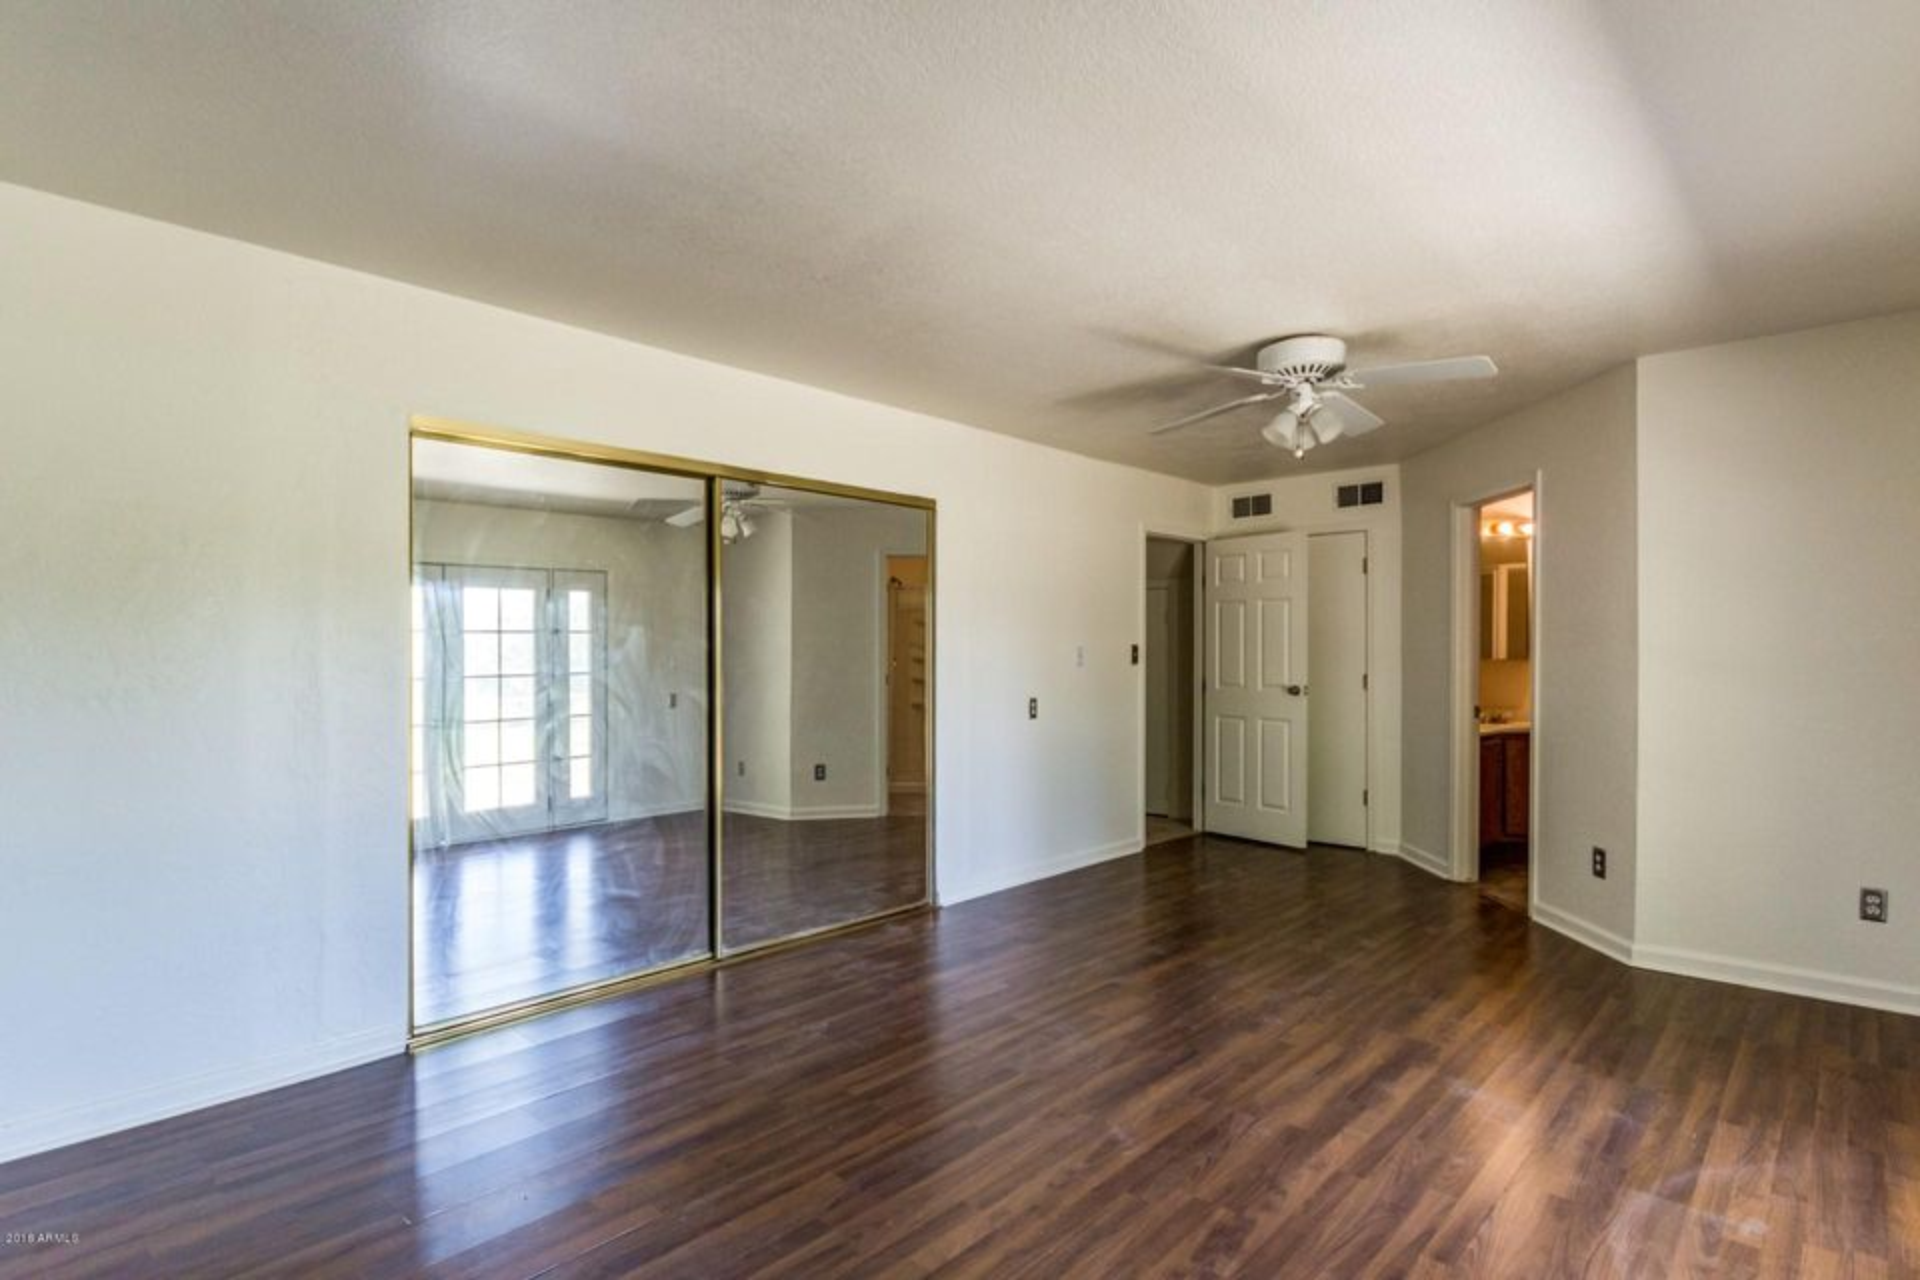 MLS 5760112 12331 W HIDALGO Avenue, Avondale, AZ 85323 Avondale AZ RV Park